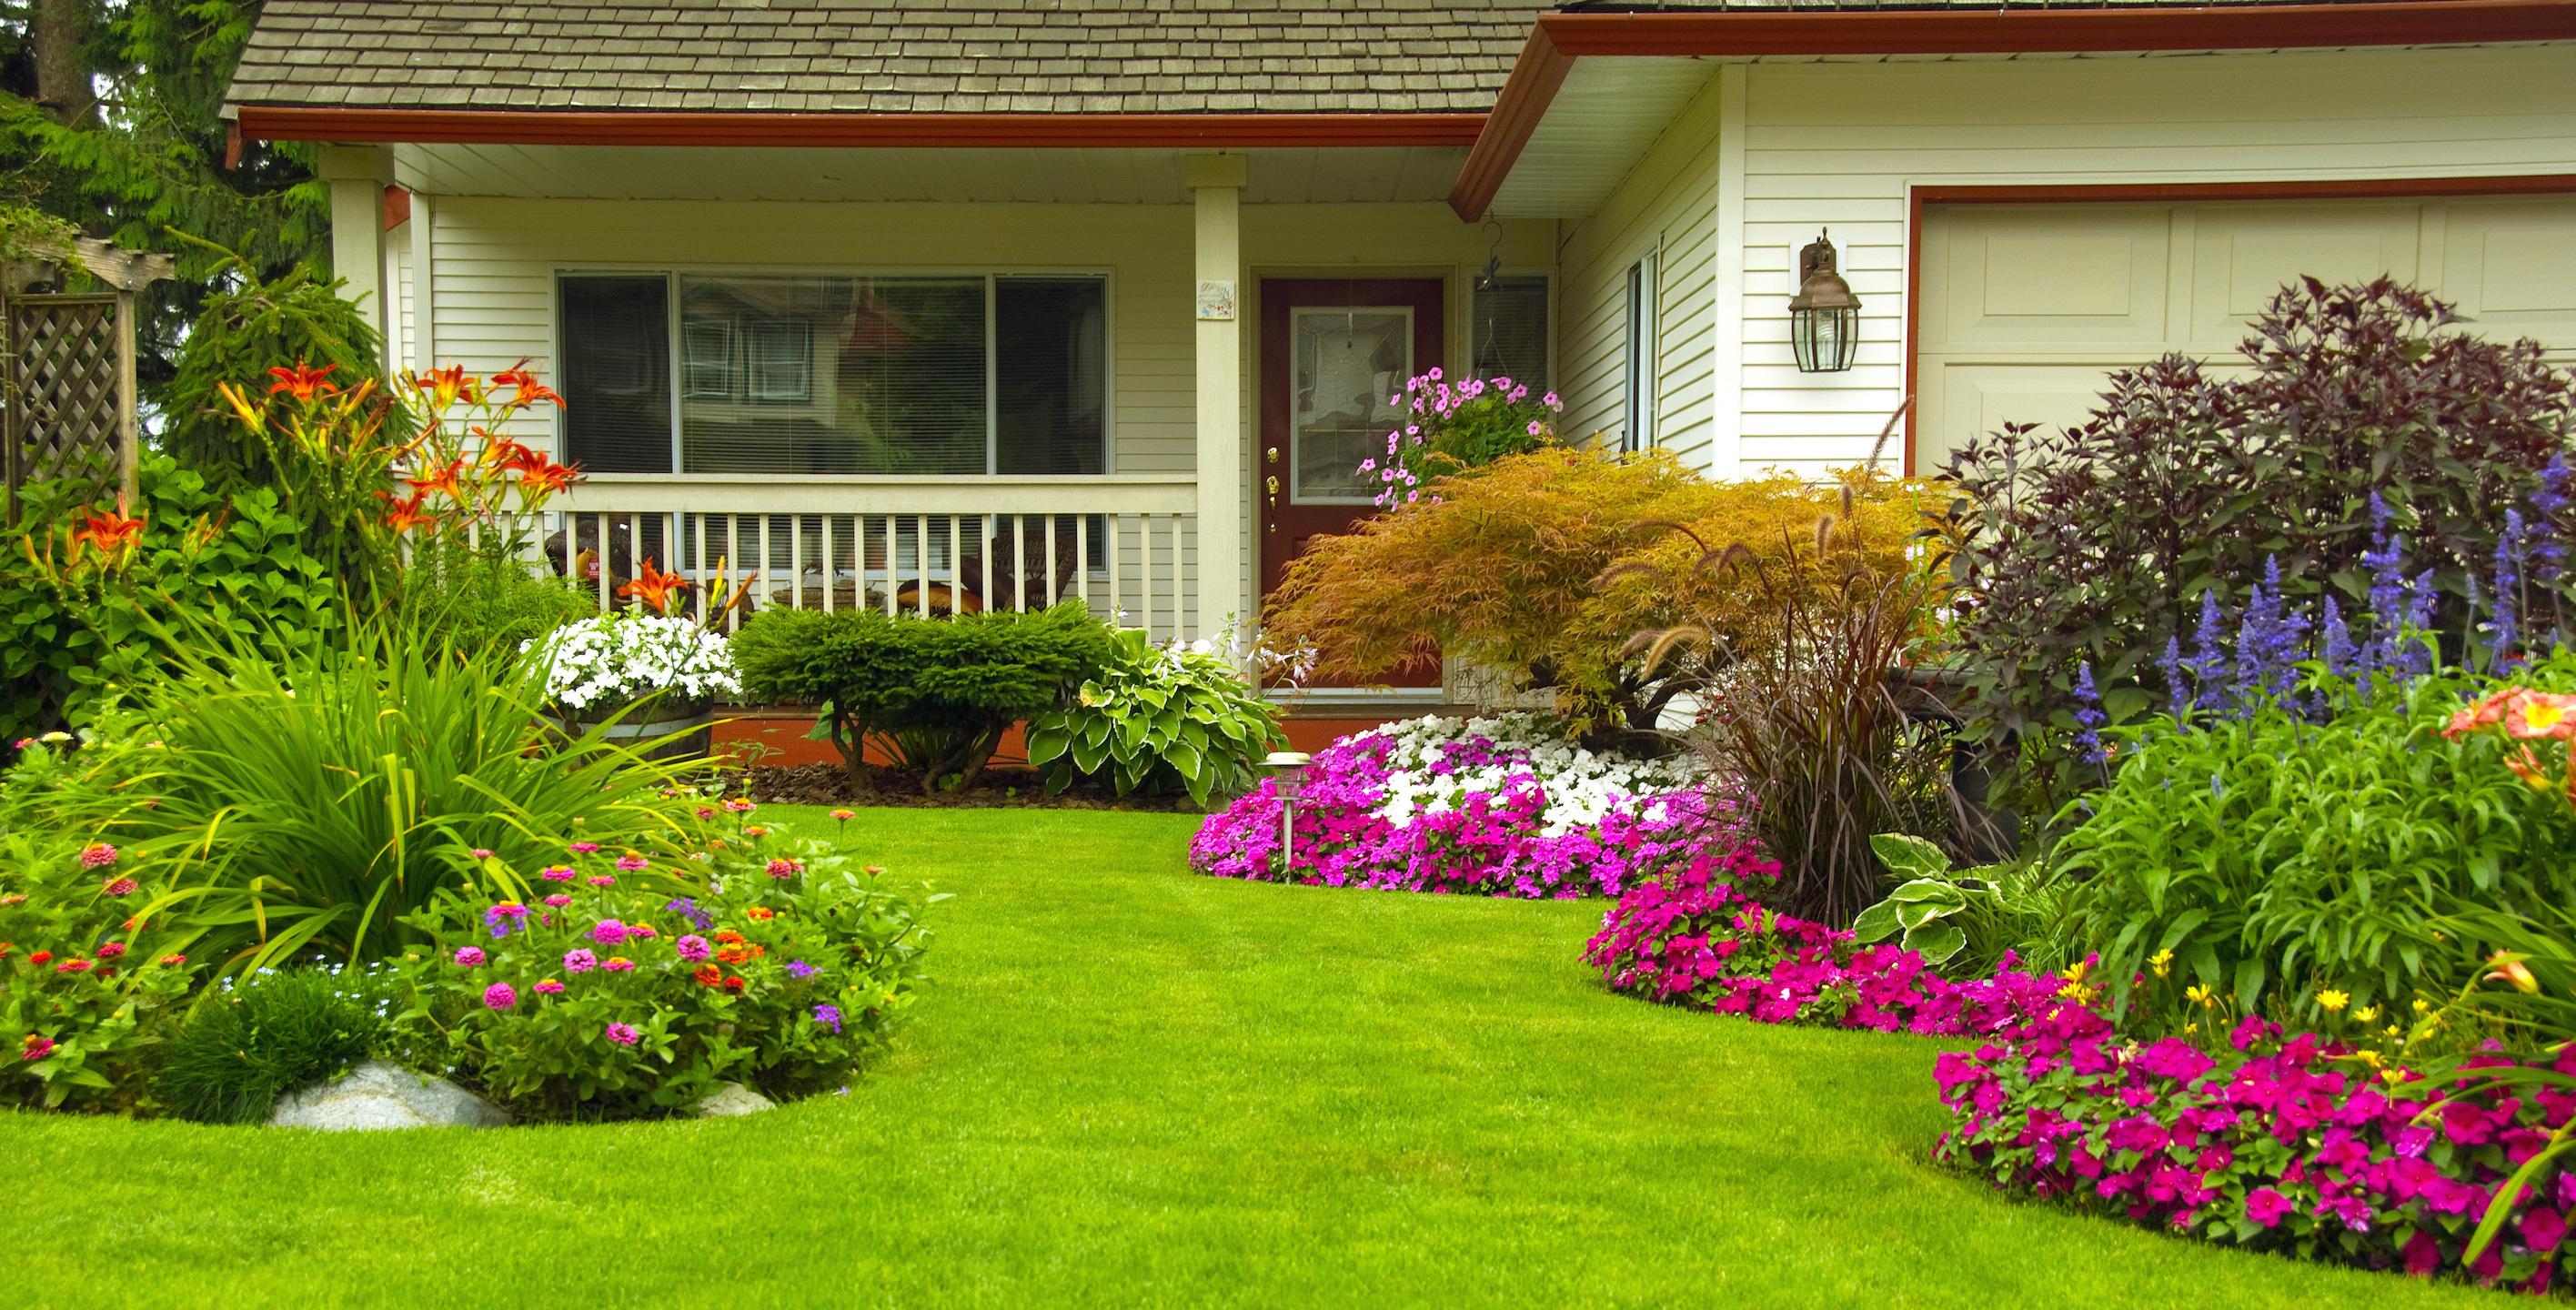 elkhart buyers agent for real estate transaction